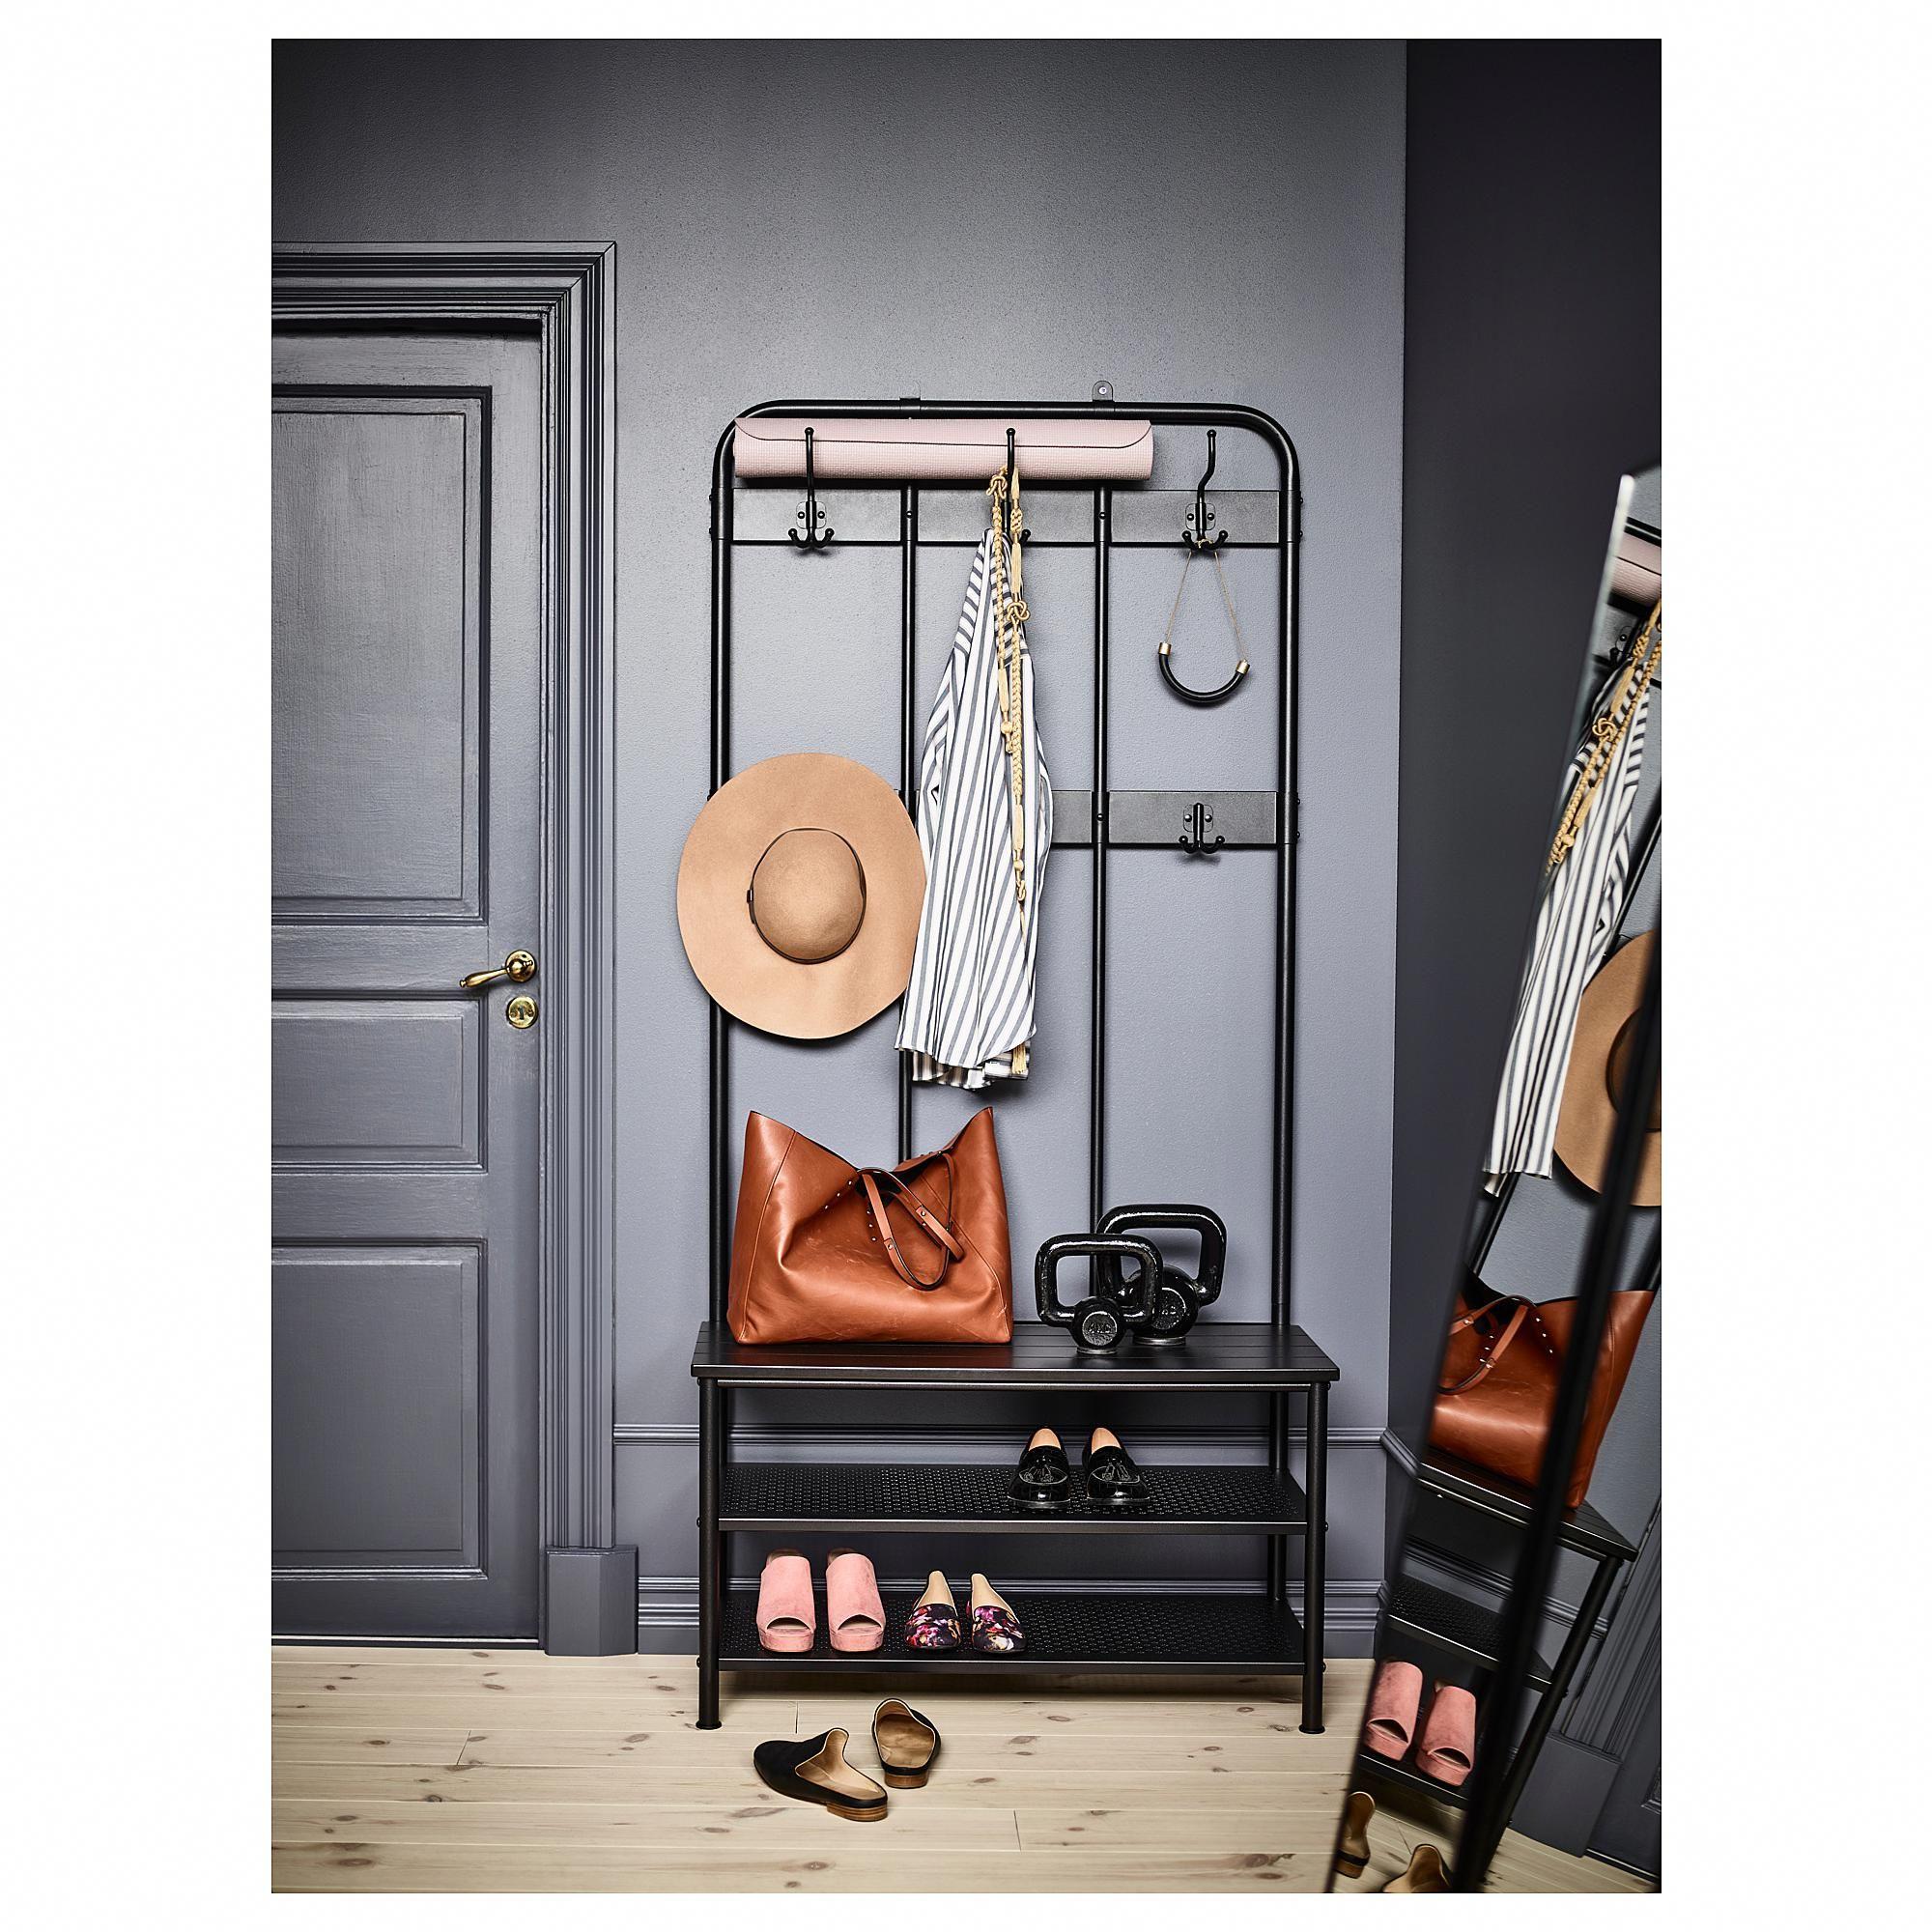 Pleasing Coat Rack Etsy Uk Coatrackblack Decorate In 2019 Shoe Theyellowbook Wood Chair Design Ideas Theyellowbookinfo